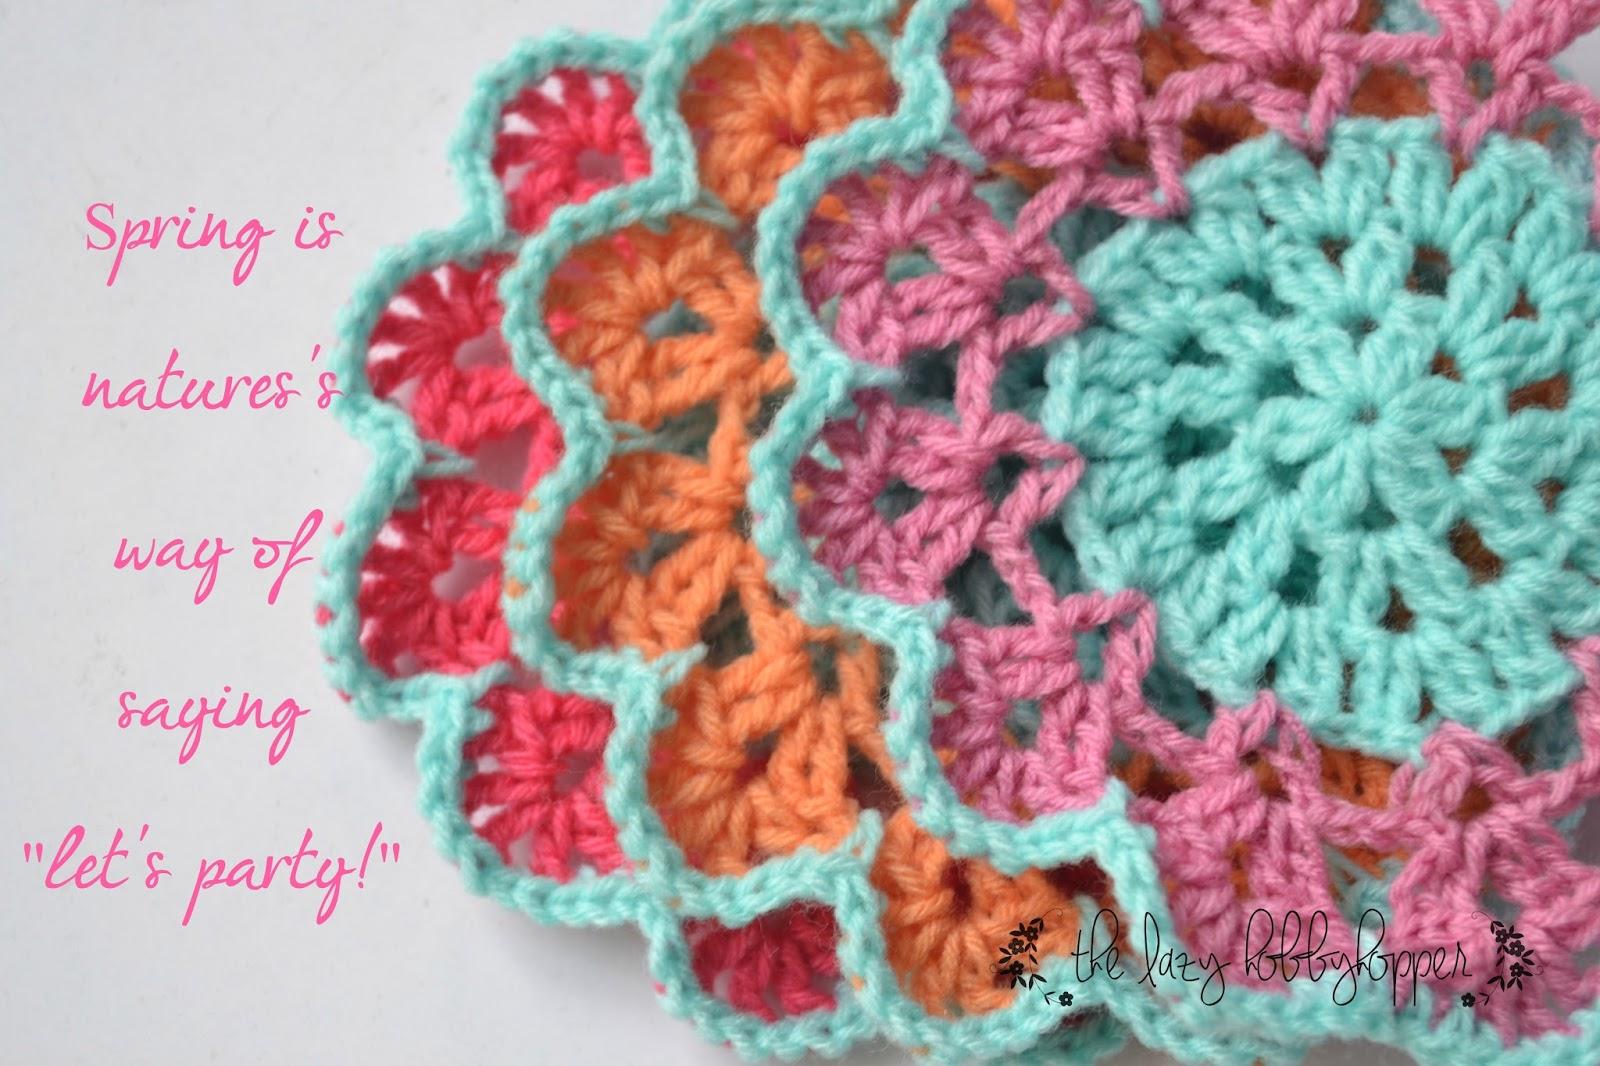 Free Crochet Double Flower Pattern : The Lazy Hobbyhopper: Spring blossom coasters - free pattern